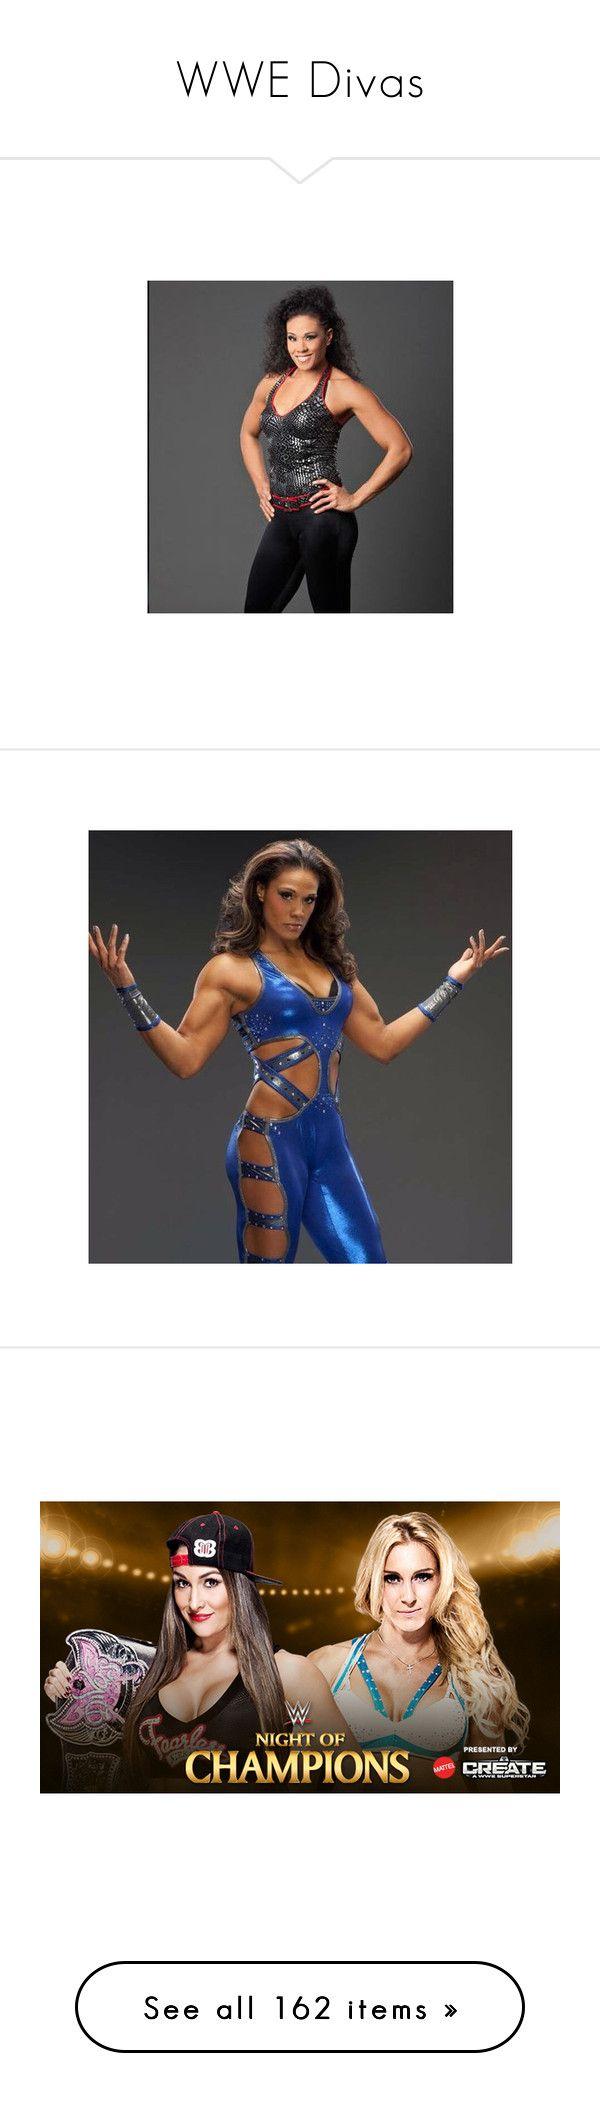 """WWE Divas"" by wrestlingloversethrollins ❤ liked on Polyvore featuring wwe, divas, people, stephanie mcmahon, wwe diva, superstars, triple h, wwe figures, nikki bella and the bella twins"